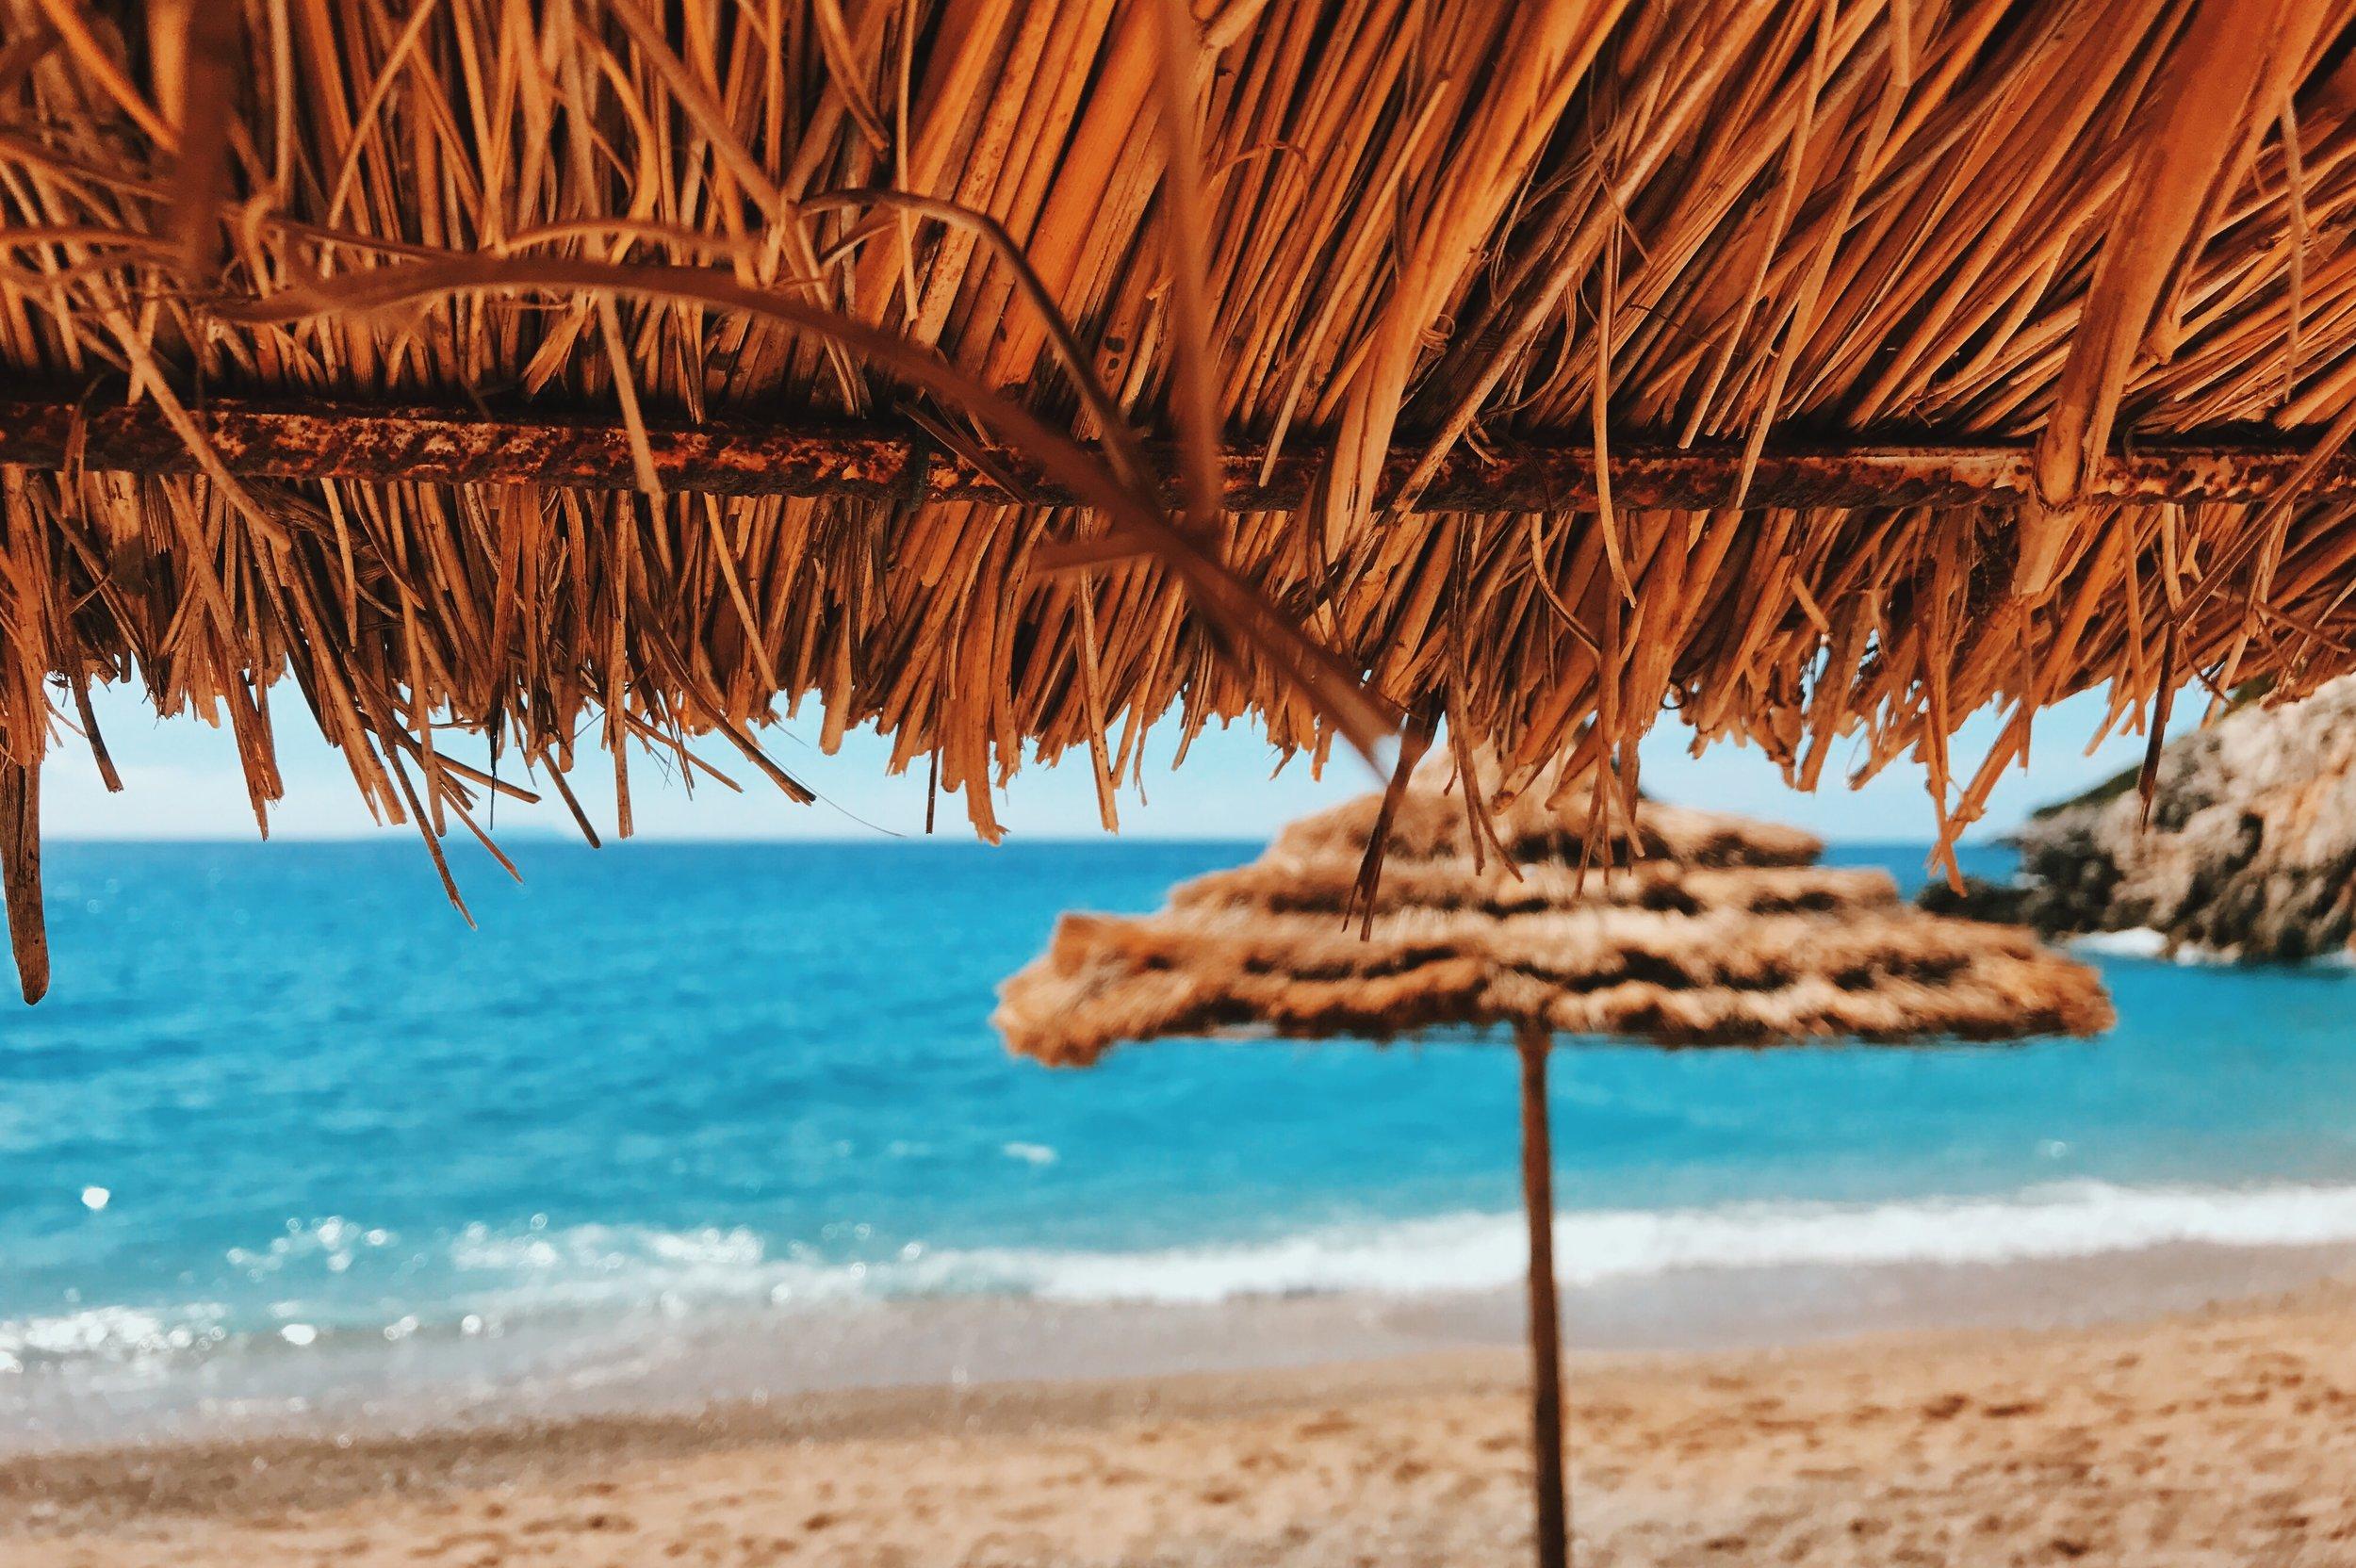 Umbrella at Gjipe beach, Albania